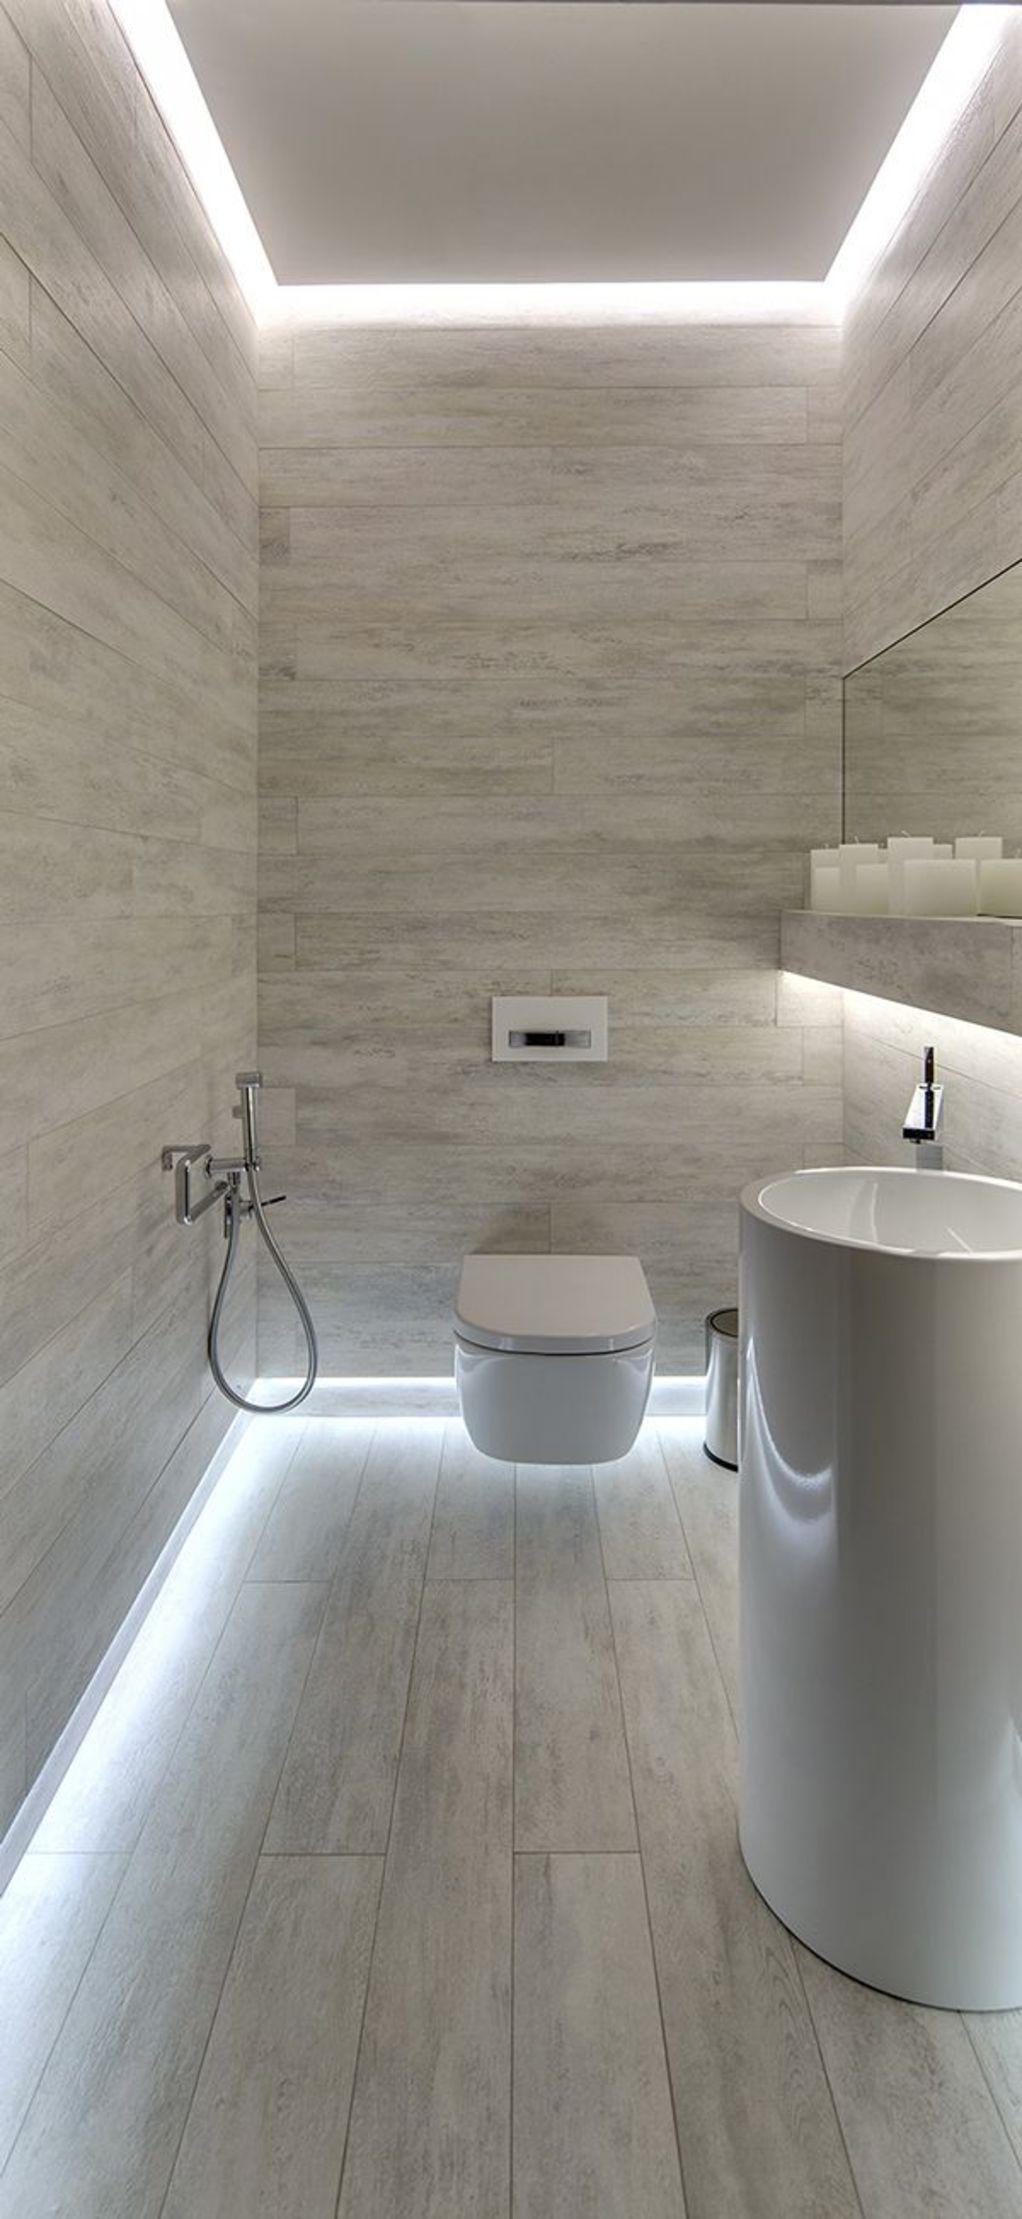 30 Examples Of Minimal Interior Design 13 Salle De Bains